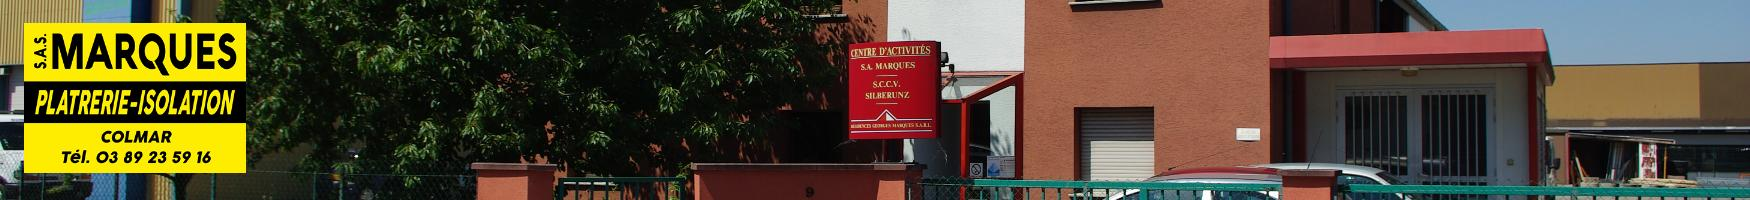 bandeau_page_marques_sas